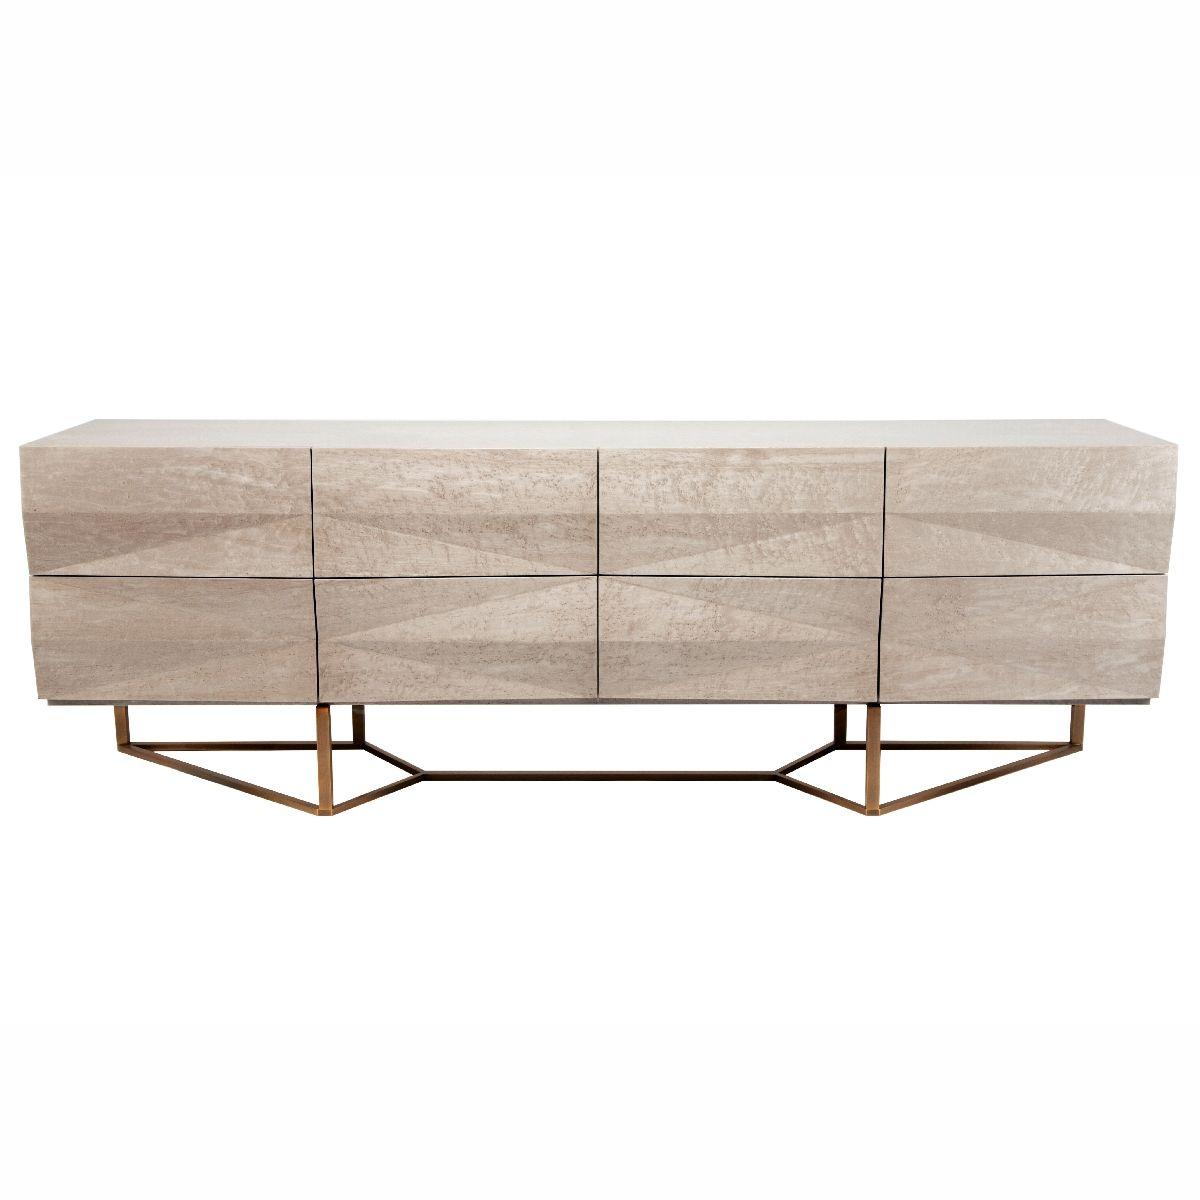 Canyon Credenza | Kim Price #exclusivedesign #luxurydesign #exclusivefurniture #goldfurniture #limitededtion #inspirationideias